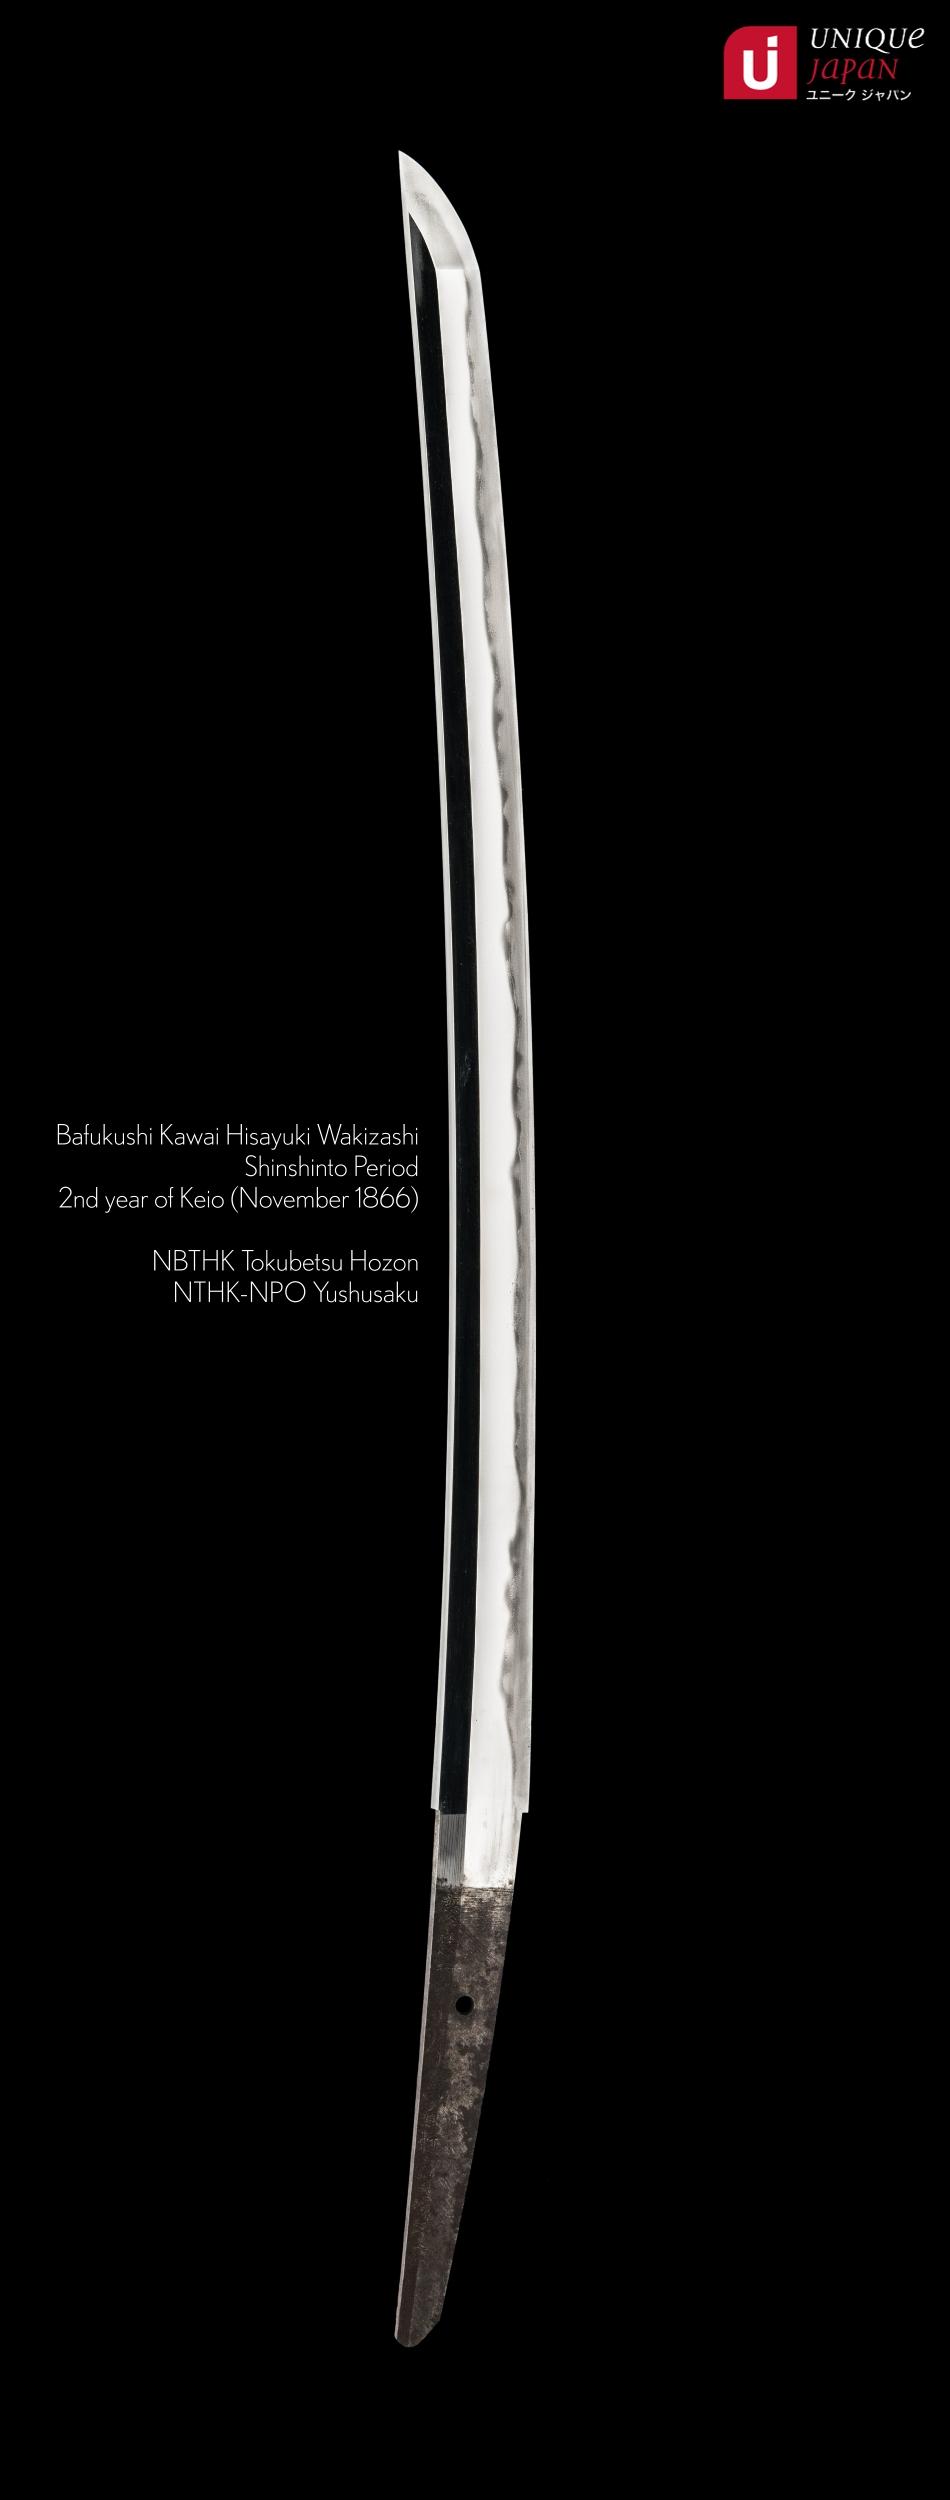 A Hisayuki Wakizashi ujwa134 Shinshinto - Unique Japan